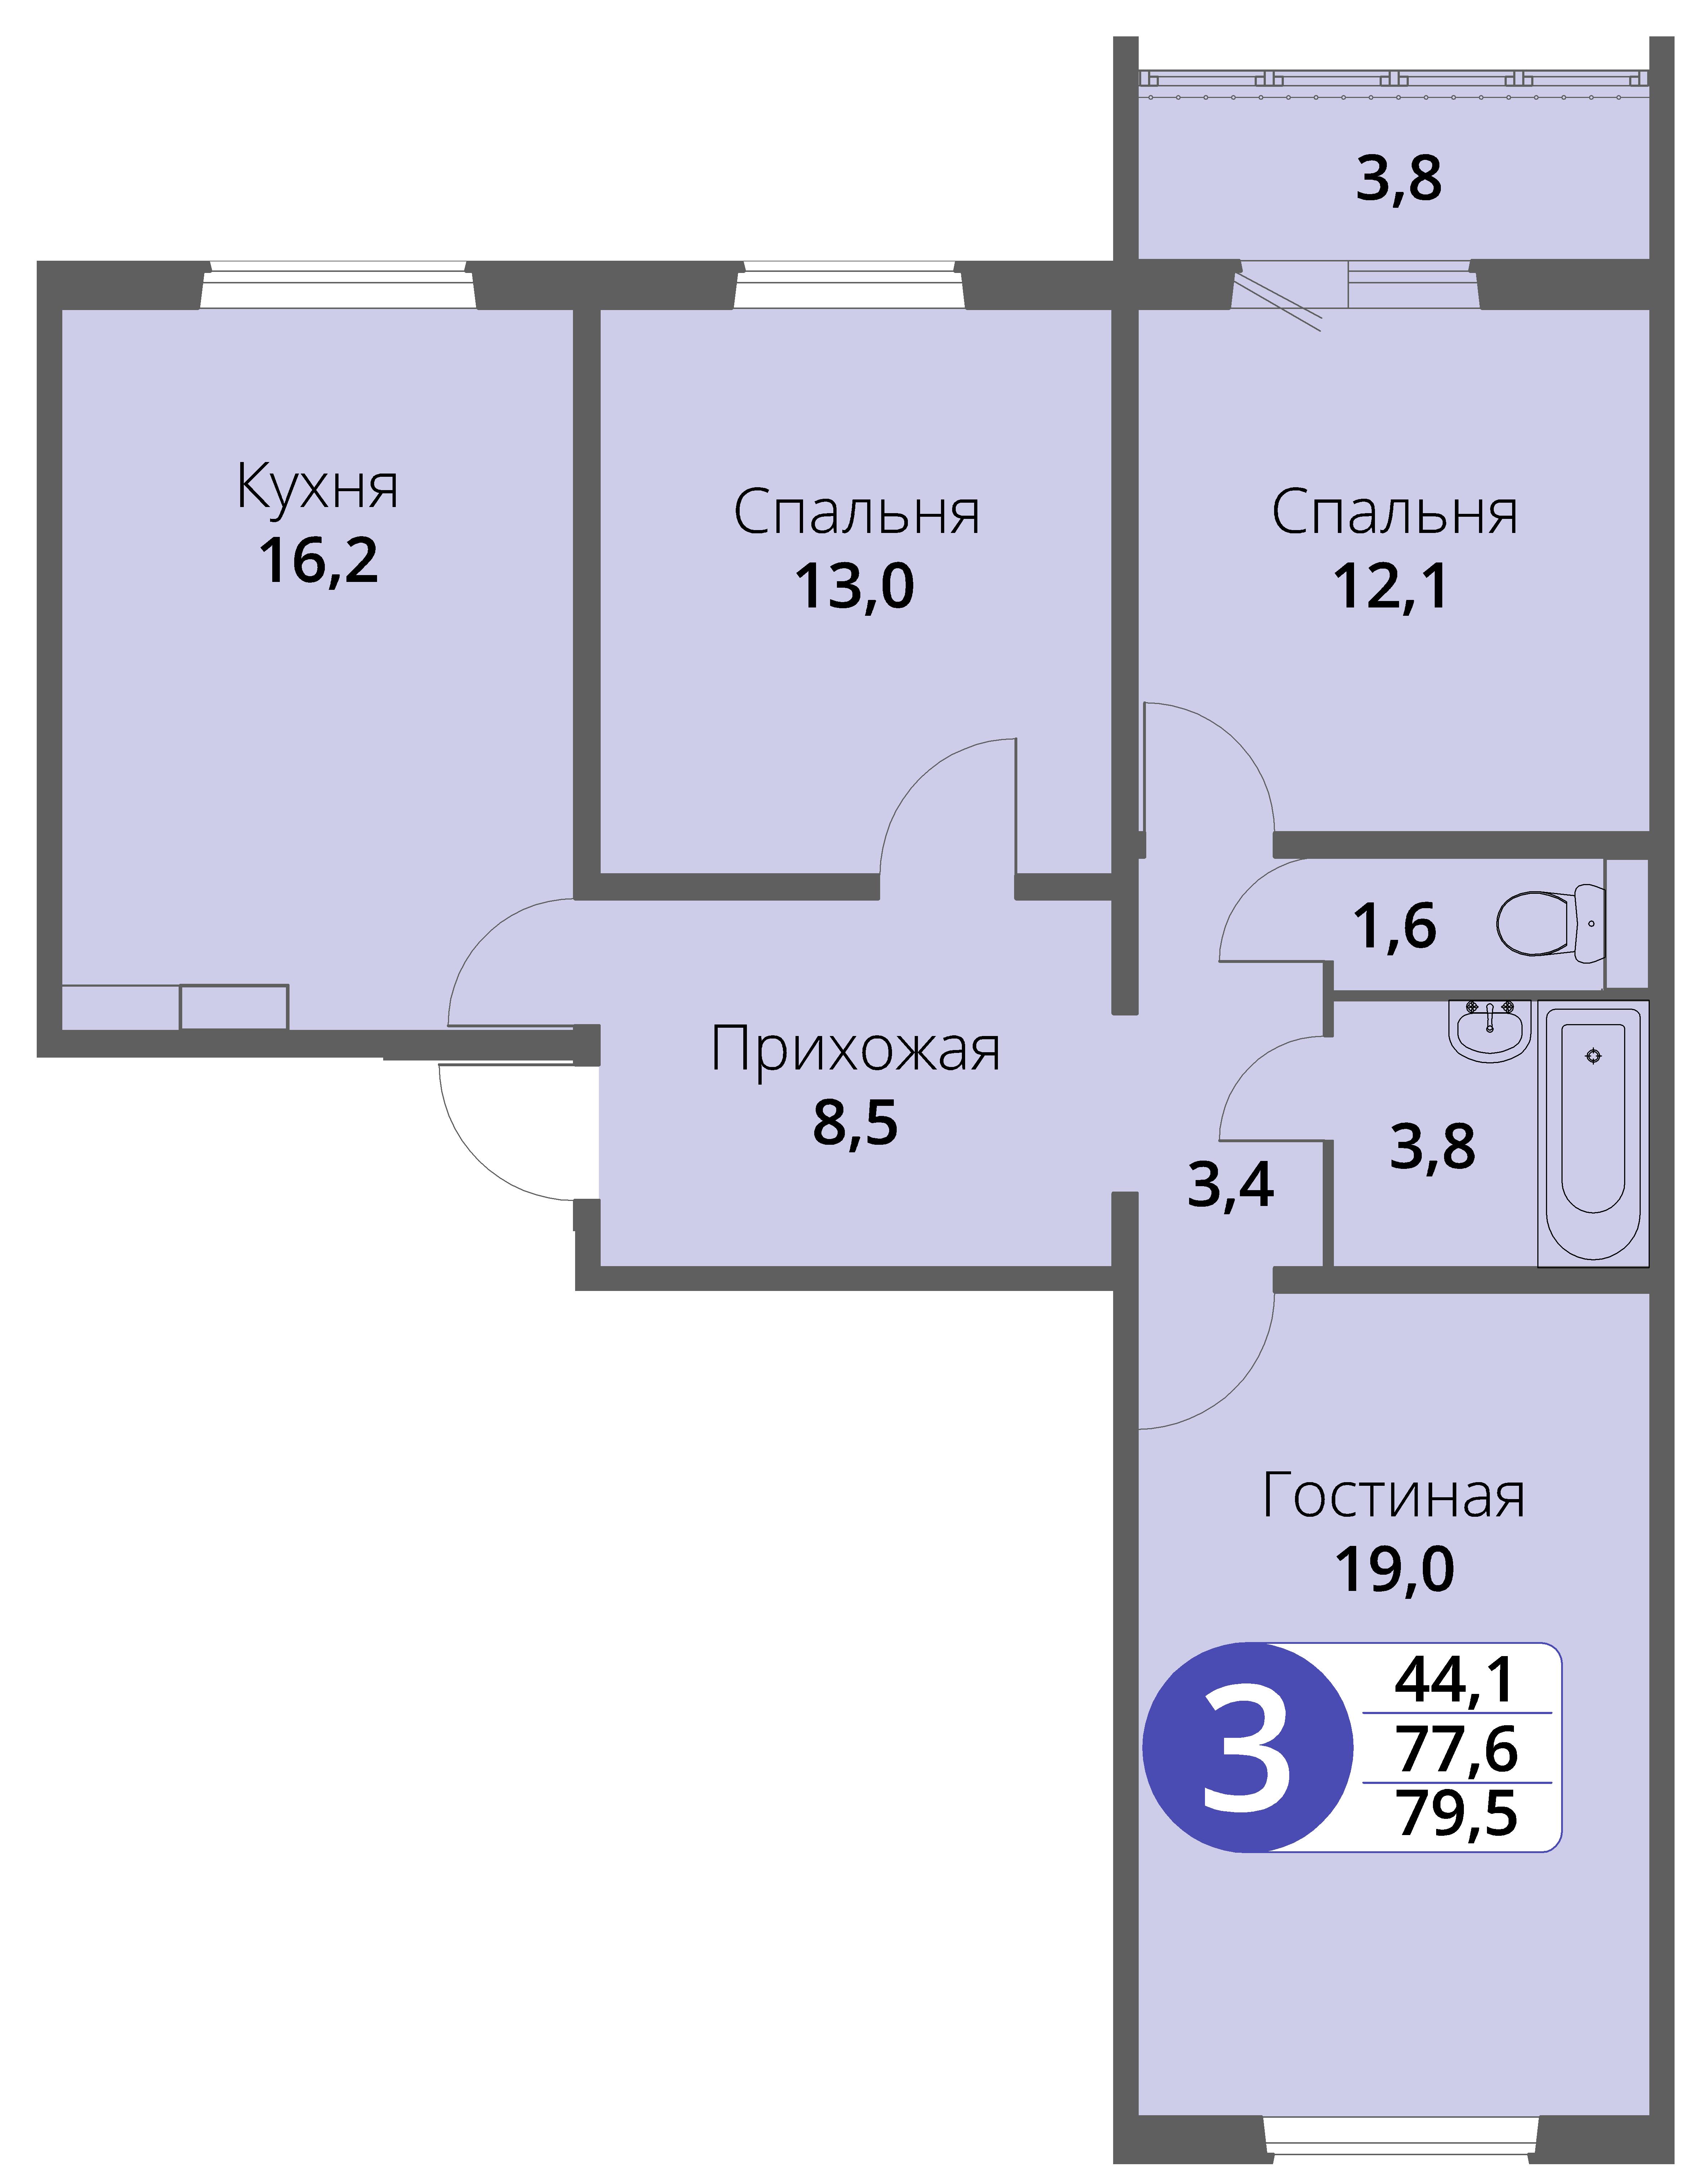 Зареченская 1-1, квартира 116 - Трехкомнатная